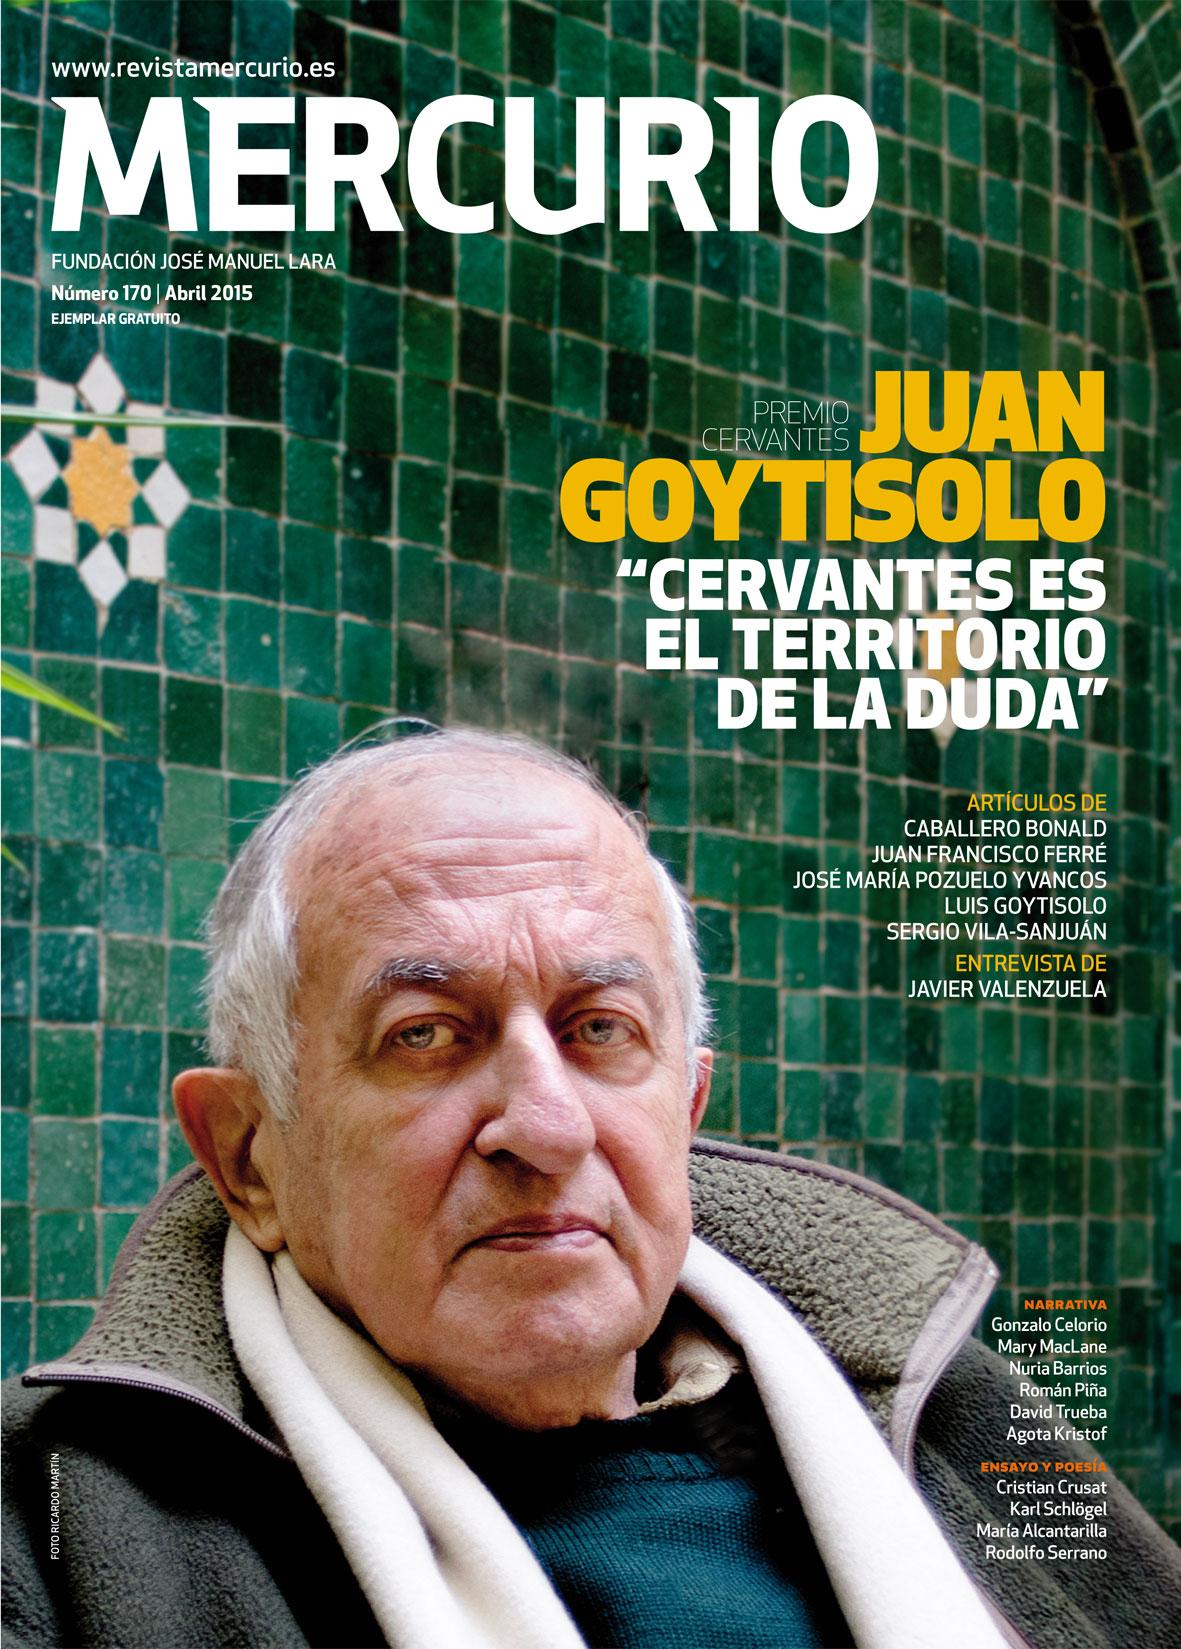 Mercurio 170. Abril 2015. Foto Ricardo Martín